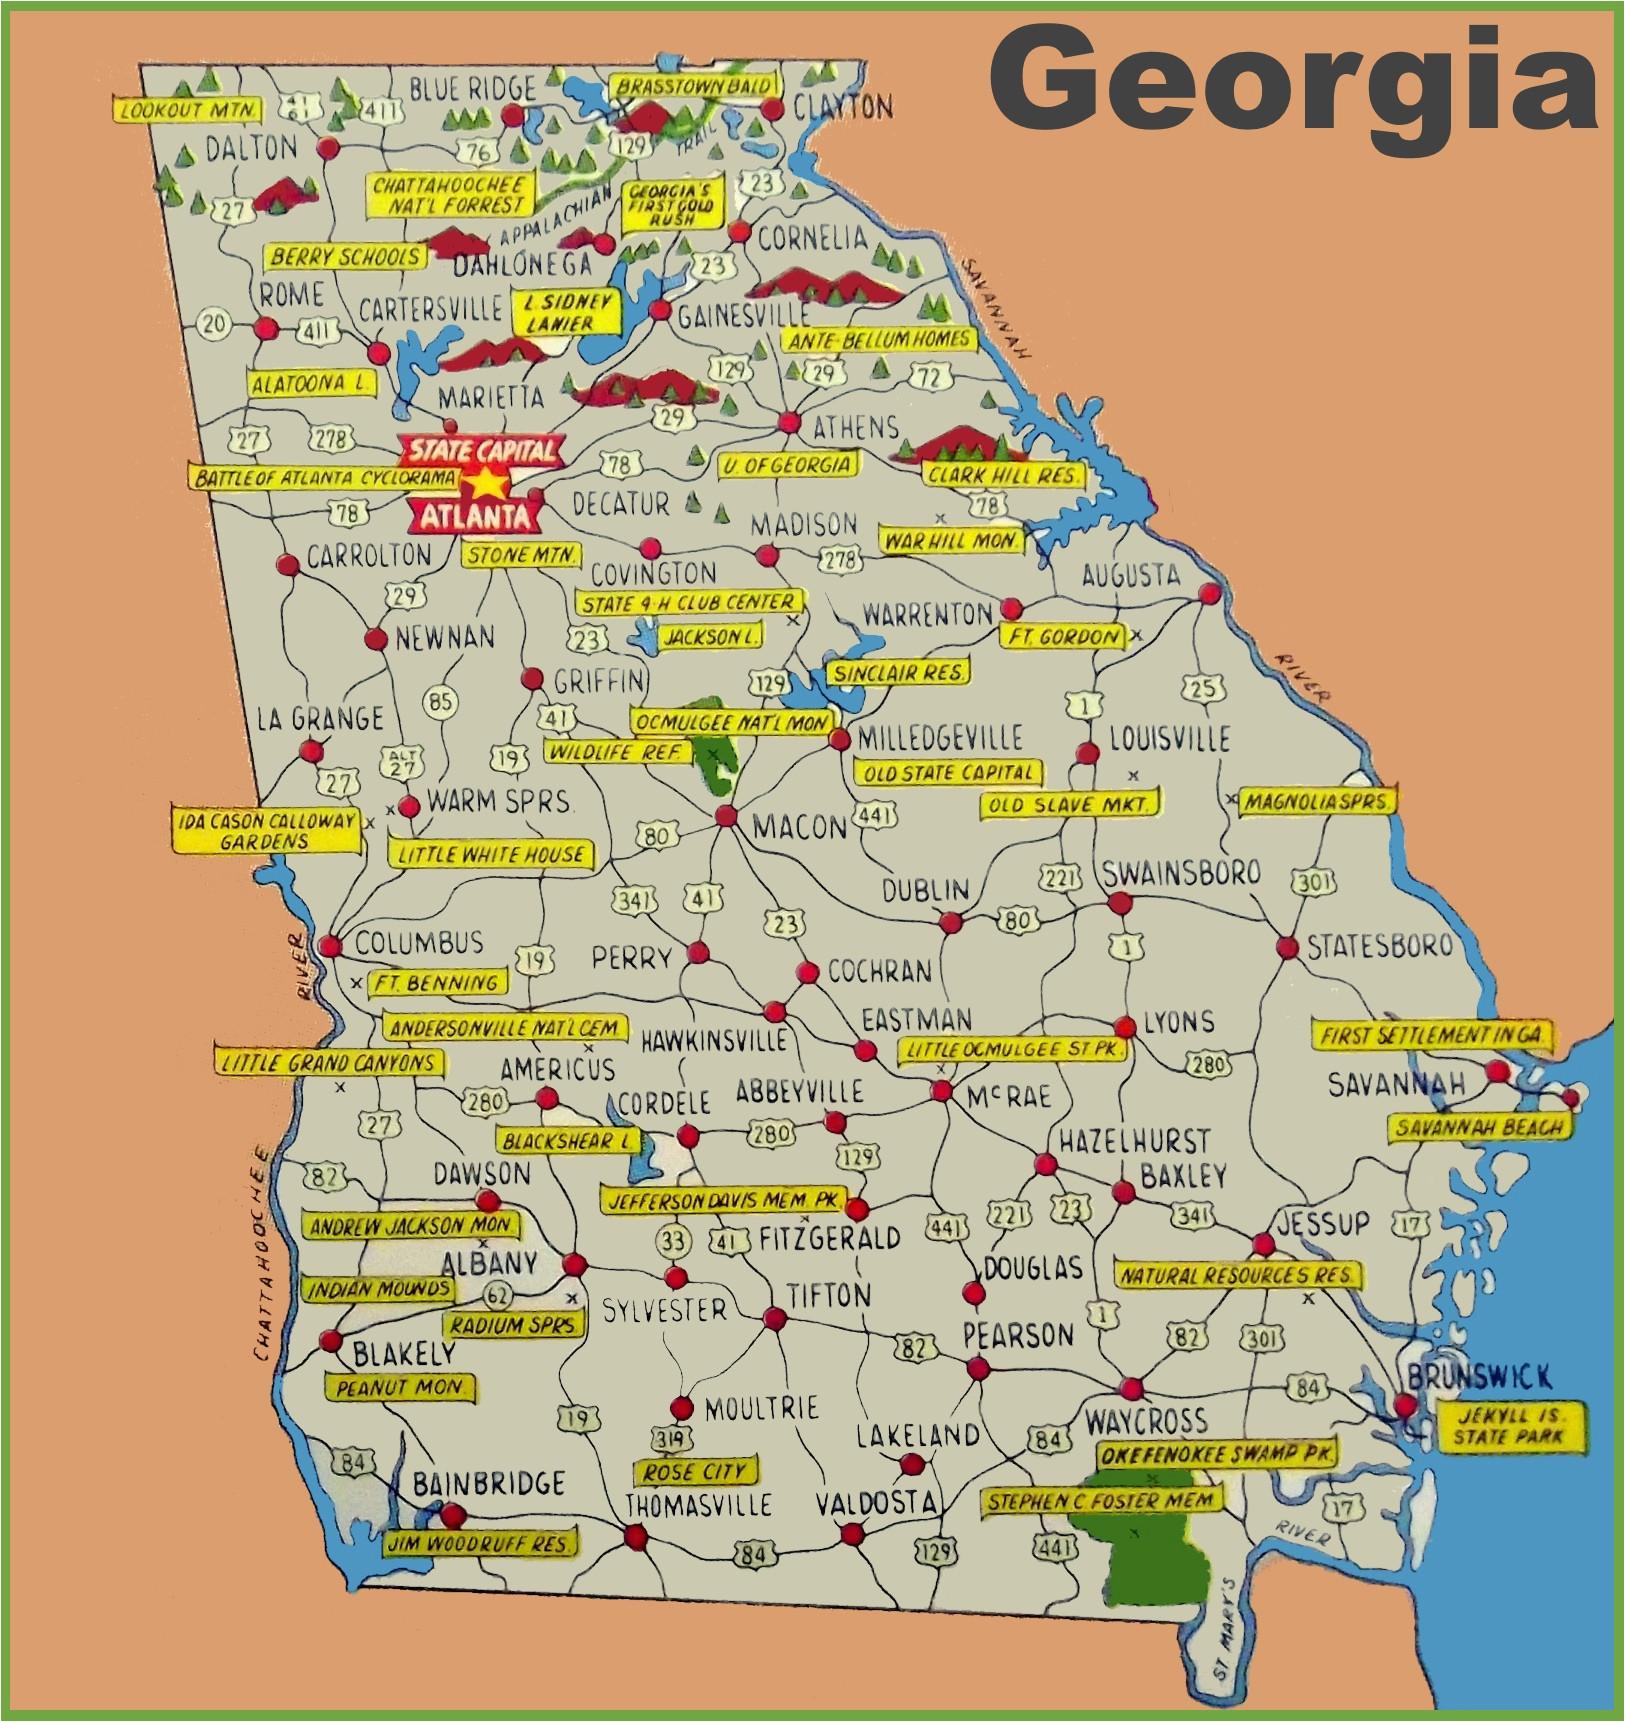 Dallas Georgia Map | secretmuseum on missouri map, georgia climate, georgia asia, maryland map, georgia country, georgia directions, indiana map, georgia region, kentucky map, minnesota map, georgia capital, georgia atlas, georgia usa, colorado map, kansas map, georgia food, georgia cities, illinois map, georgia history, georgia outline, georgia car, new jersey map, maine map, georgia attractions, idaho map, georgia city, north carolina map, georgia coastal towns, montana map, hawaii map, iowa map, georgia europe, georgia flag, georgia colony, georgia roadmap,